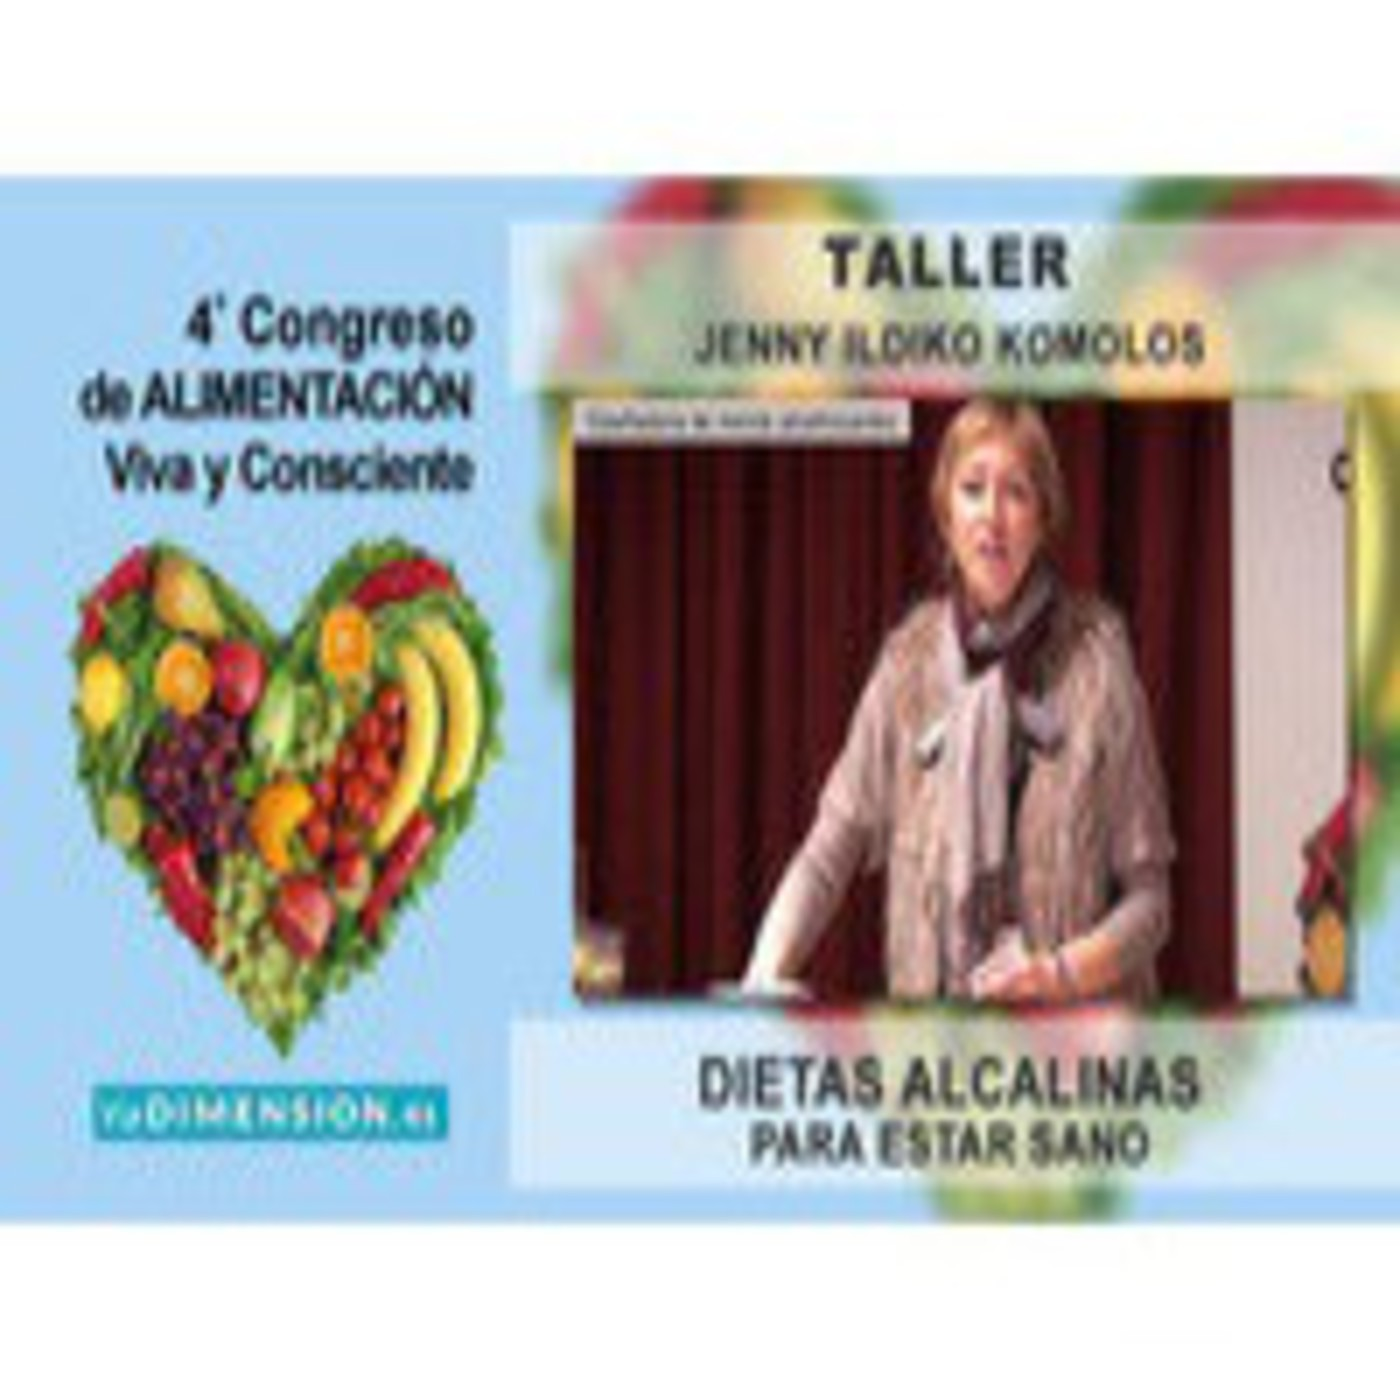 Taller: Dietas Alcalinas para estar Sano - Jenny Ildiko Komlos